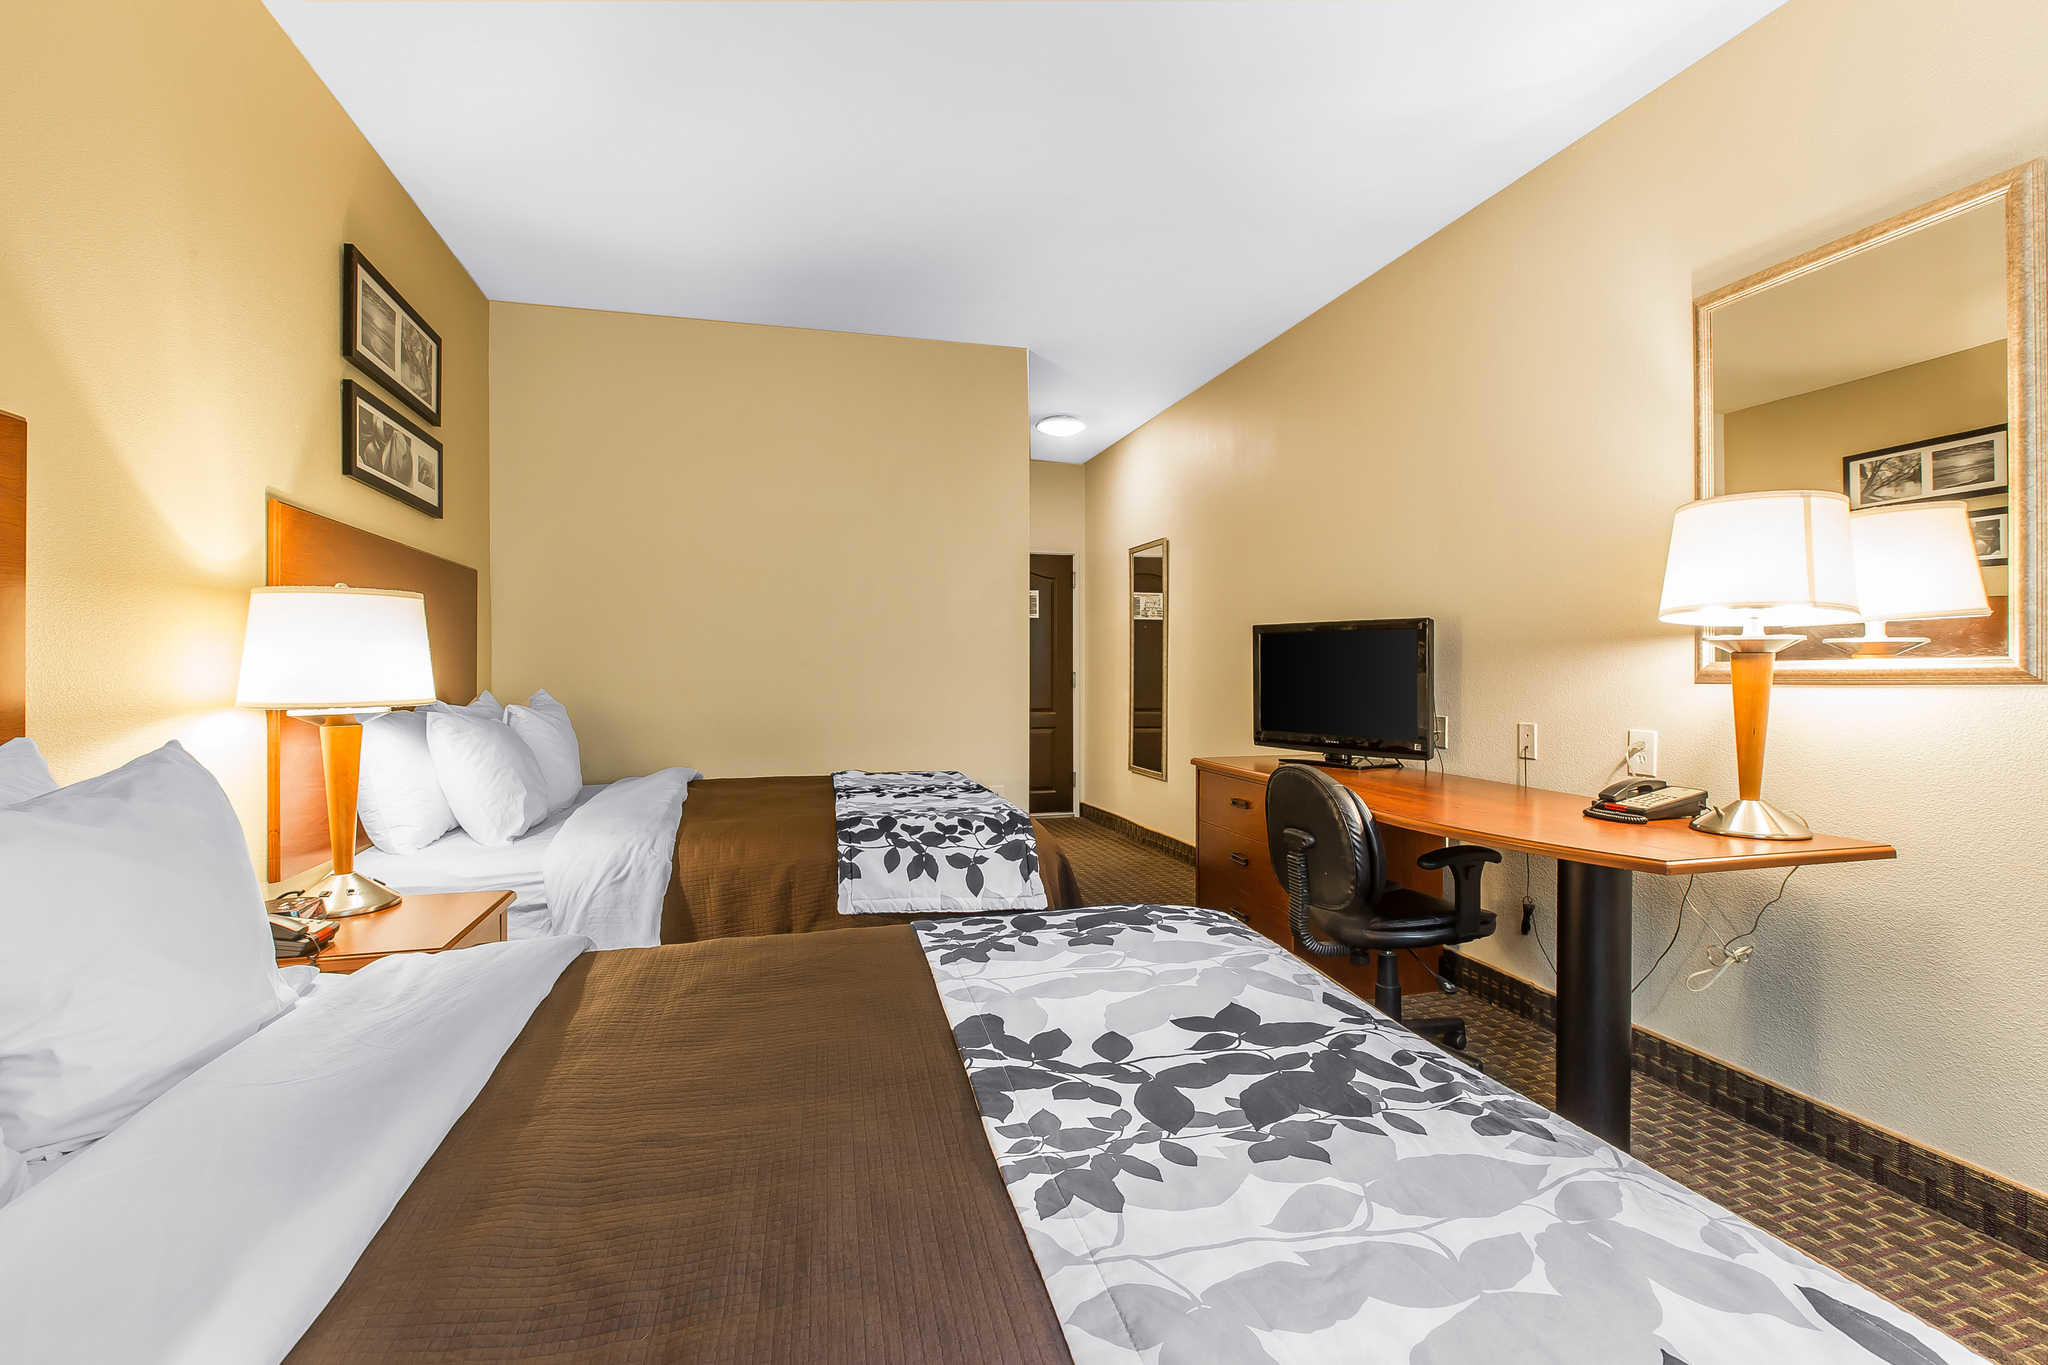 Sleep Inn & Suites At Kennesaw State University image 12